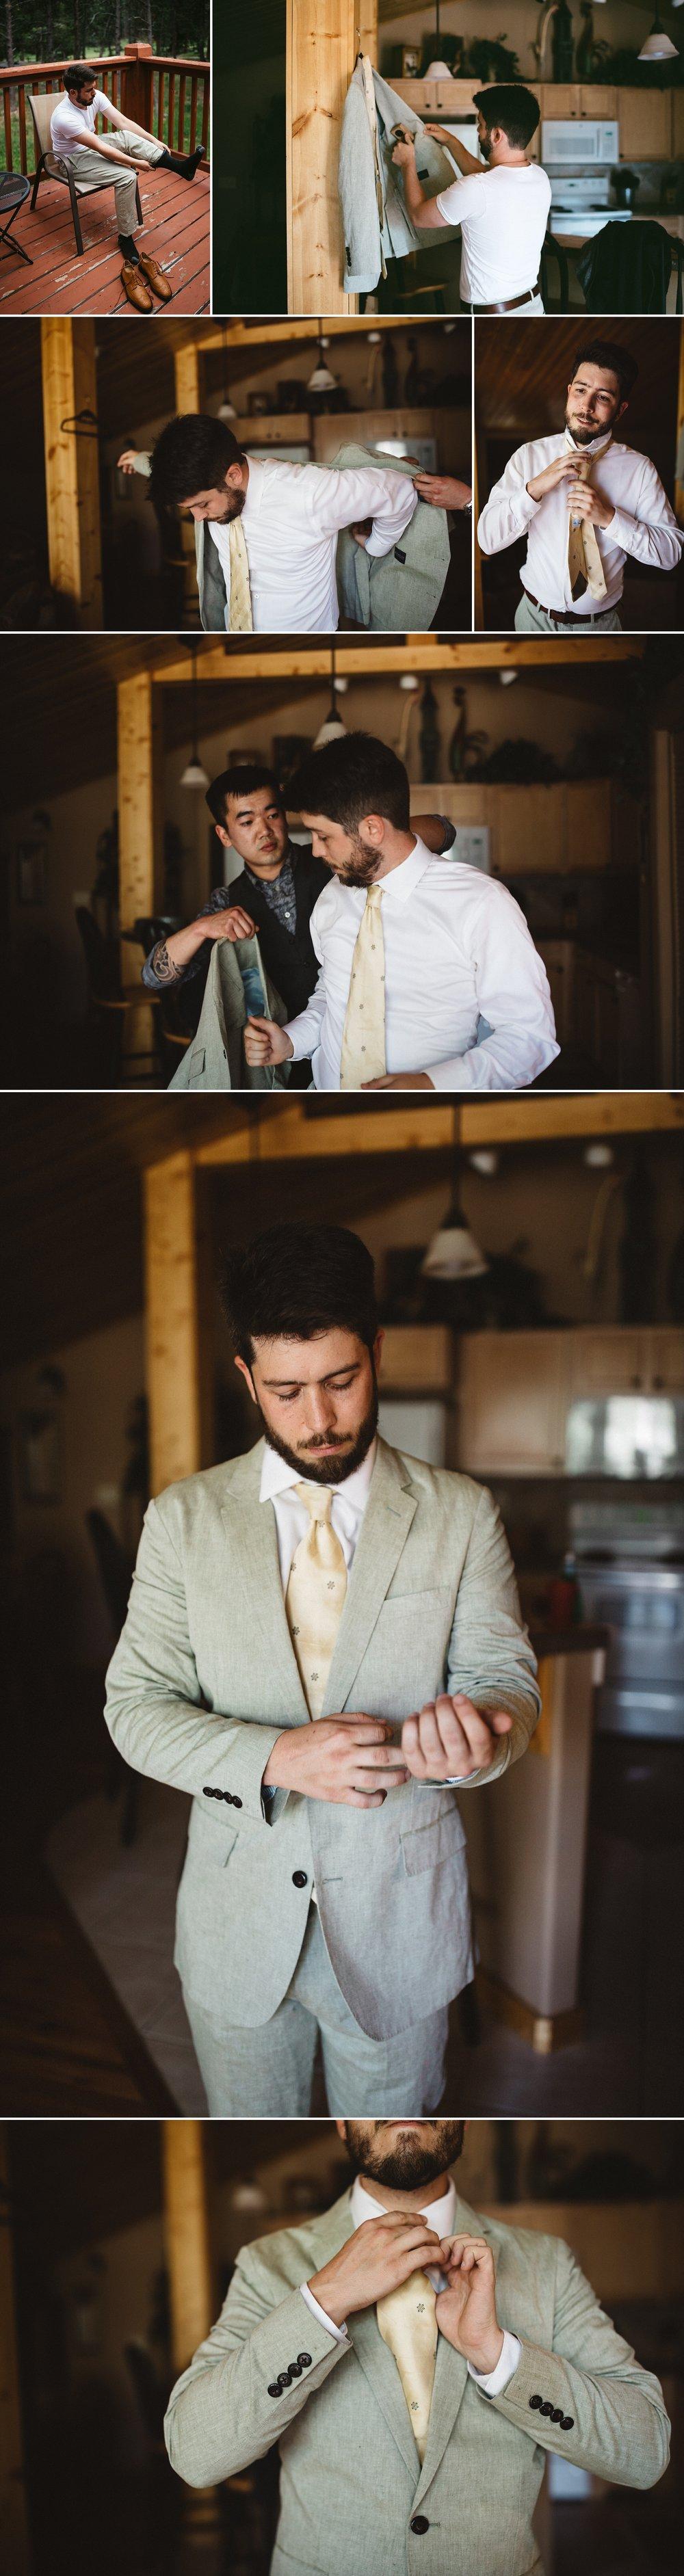 Ansley+Julian-Willow-Creek-Ranch-Evergreen-Wedding-005_WEB.jpg